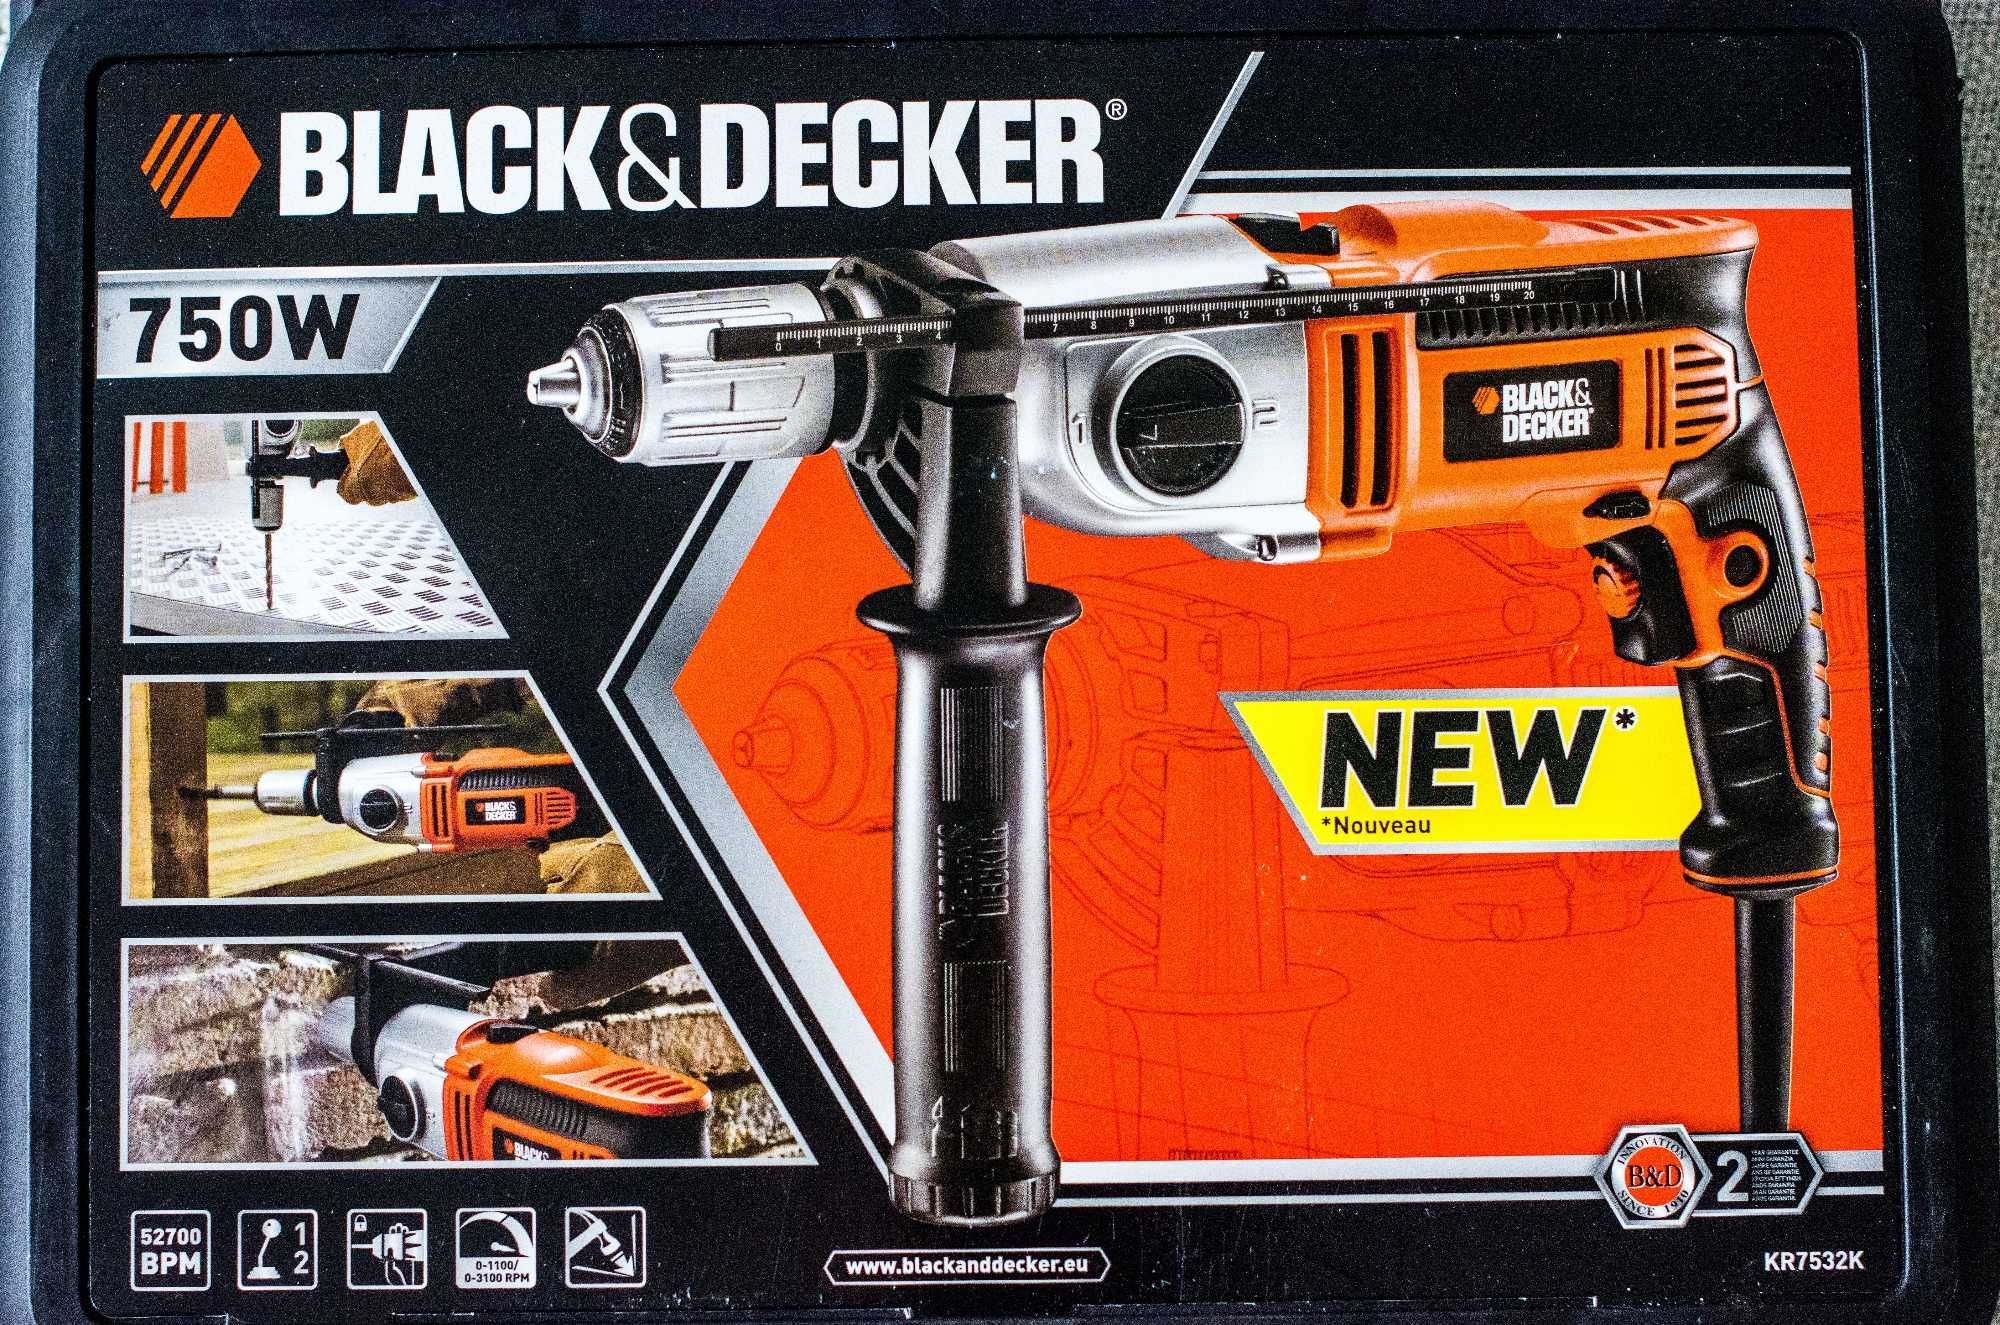 Wiertarka Udarowa Black&Decker 750W KR7532K